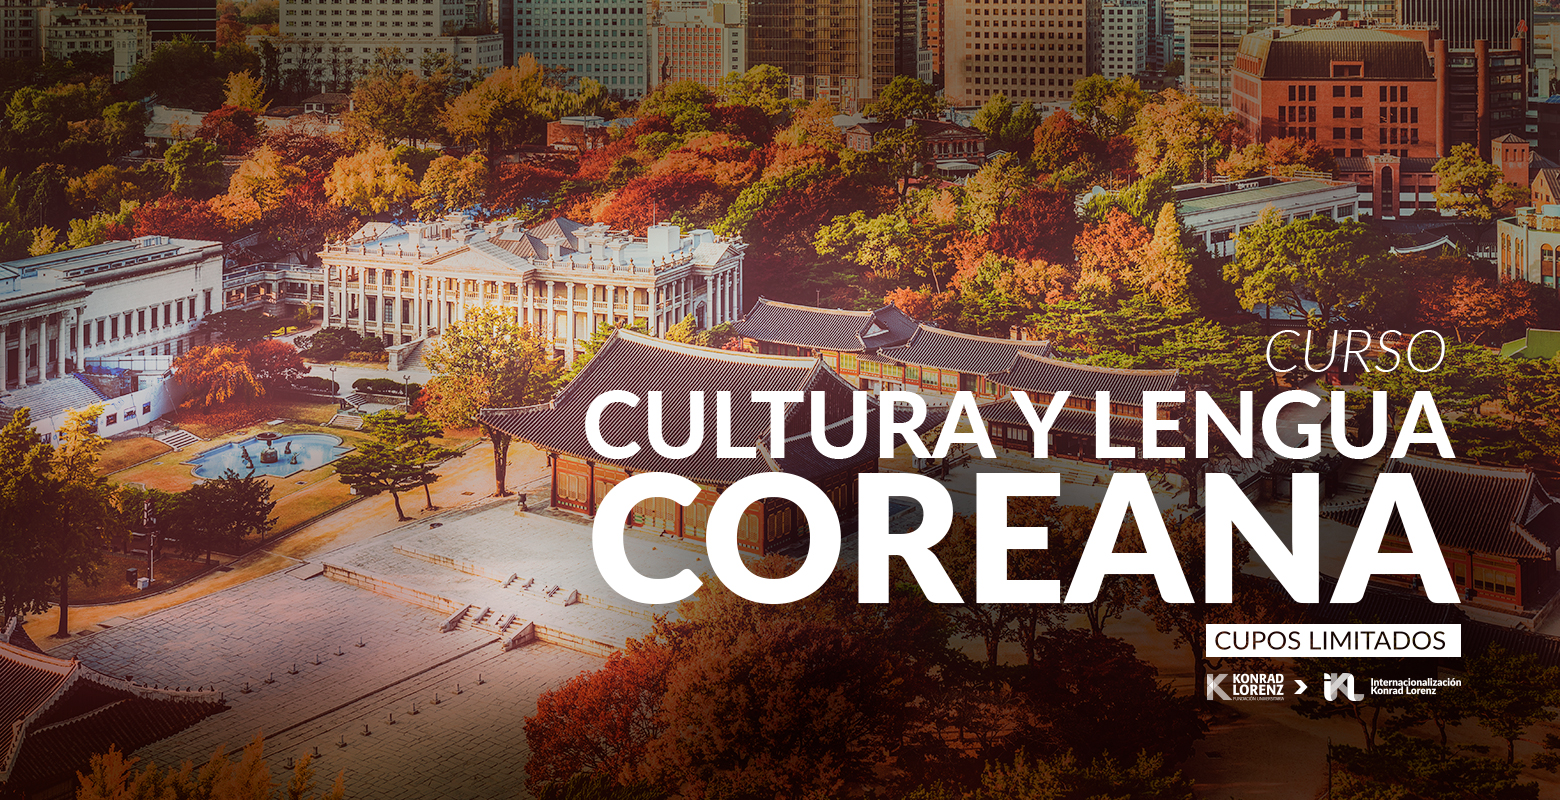 Curso Cultura y lengua Coreana